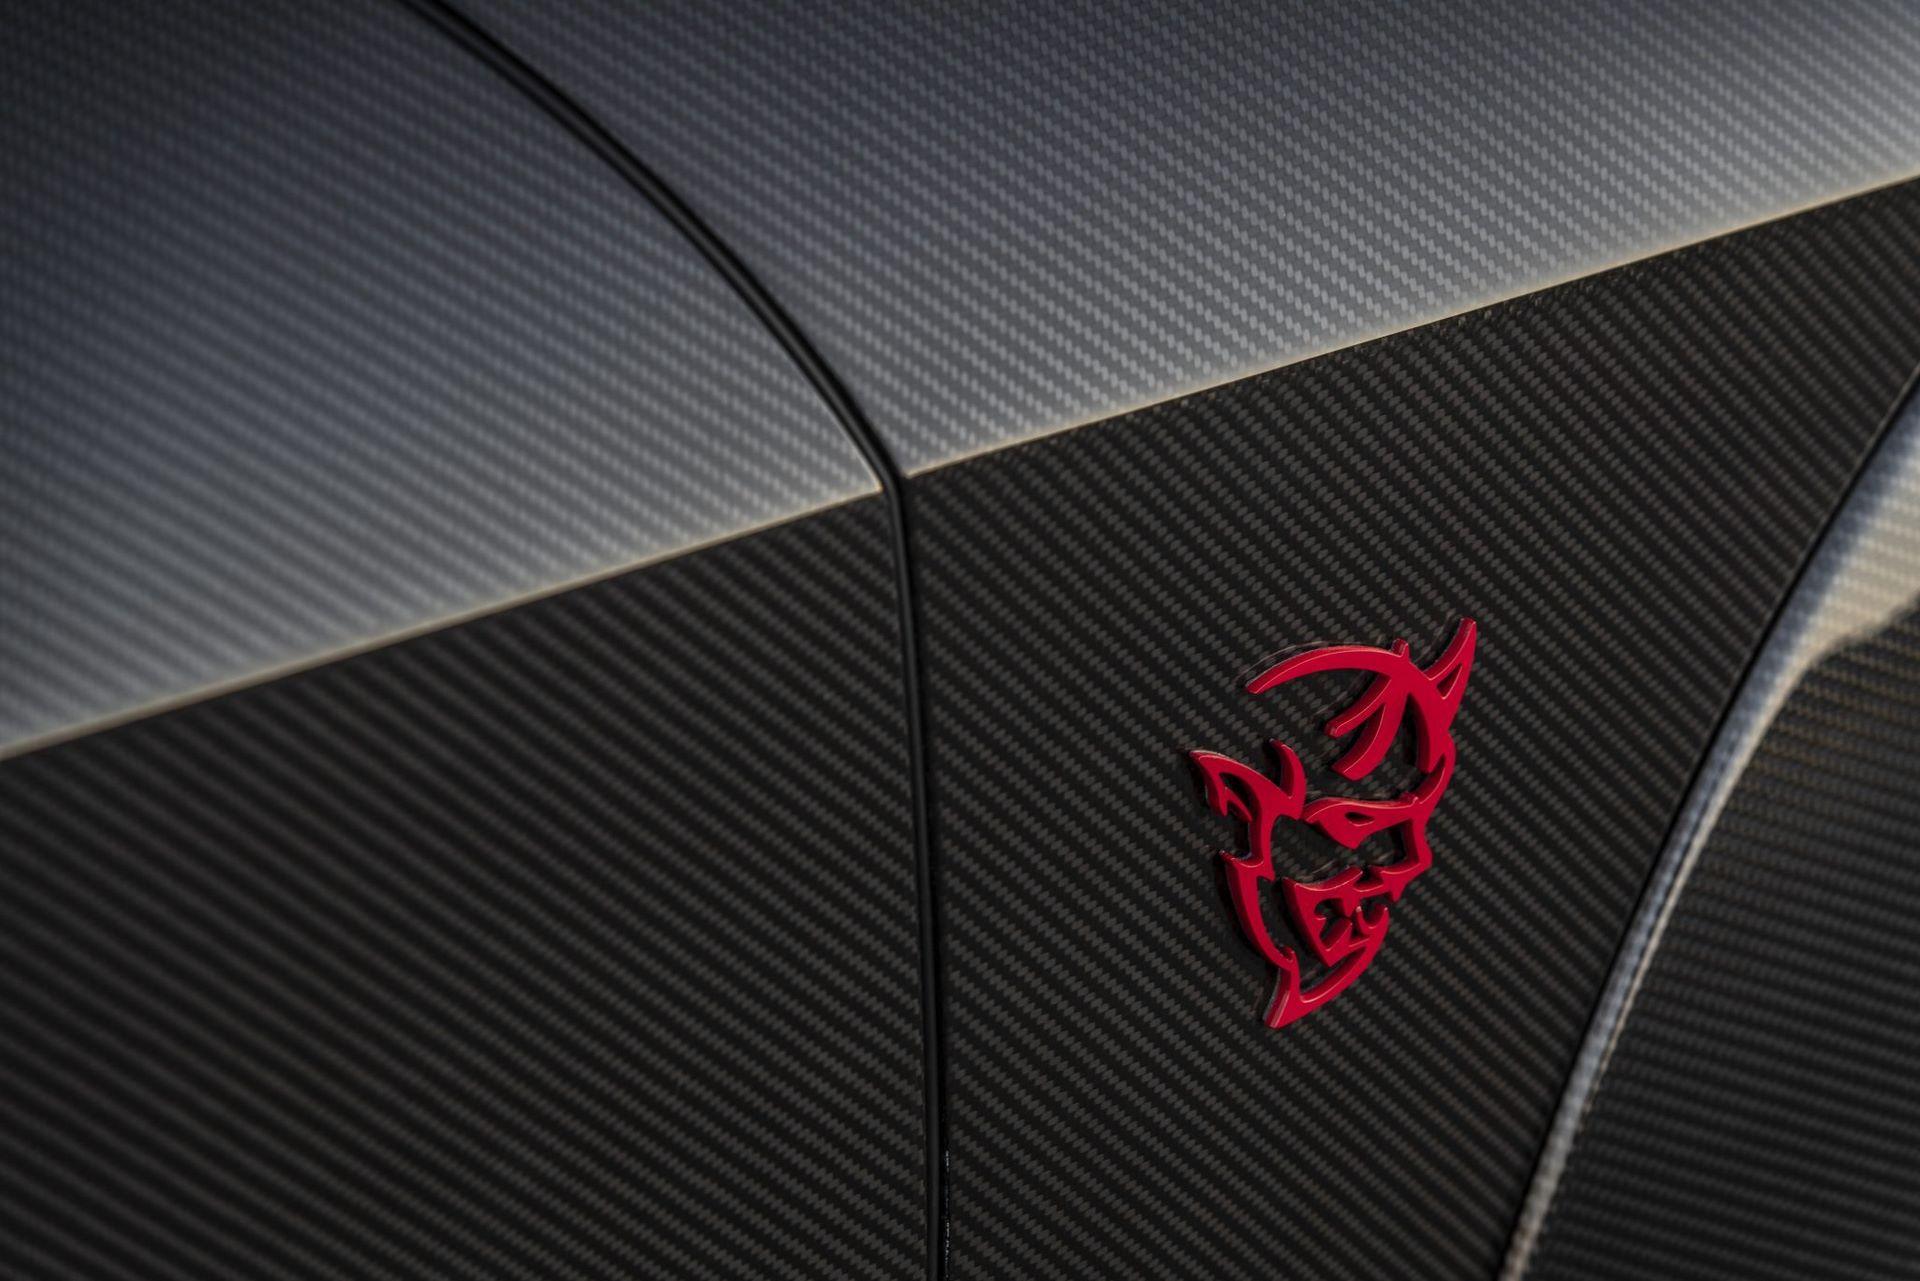 Dodge-Challenger-SRT-Demon-Carbon-by-Speedkore-12